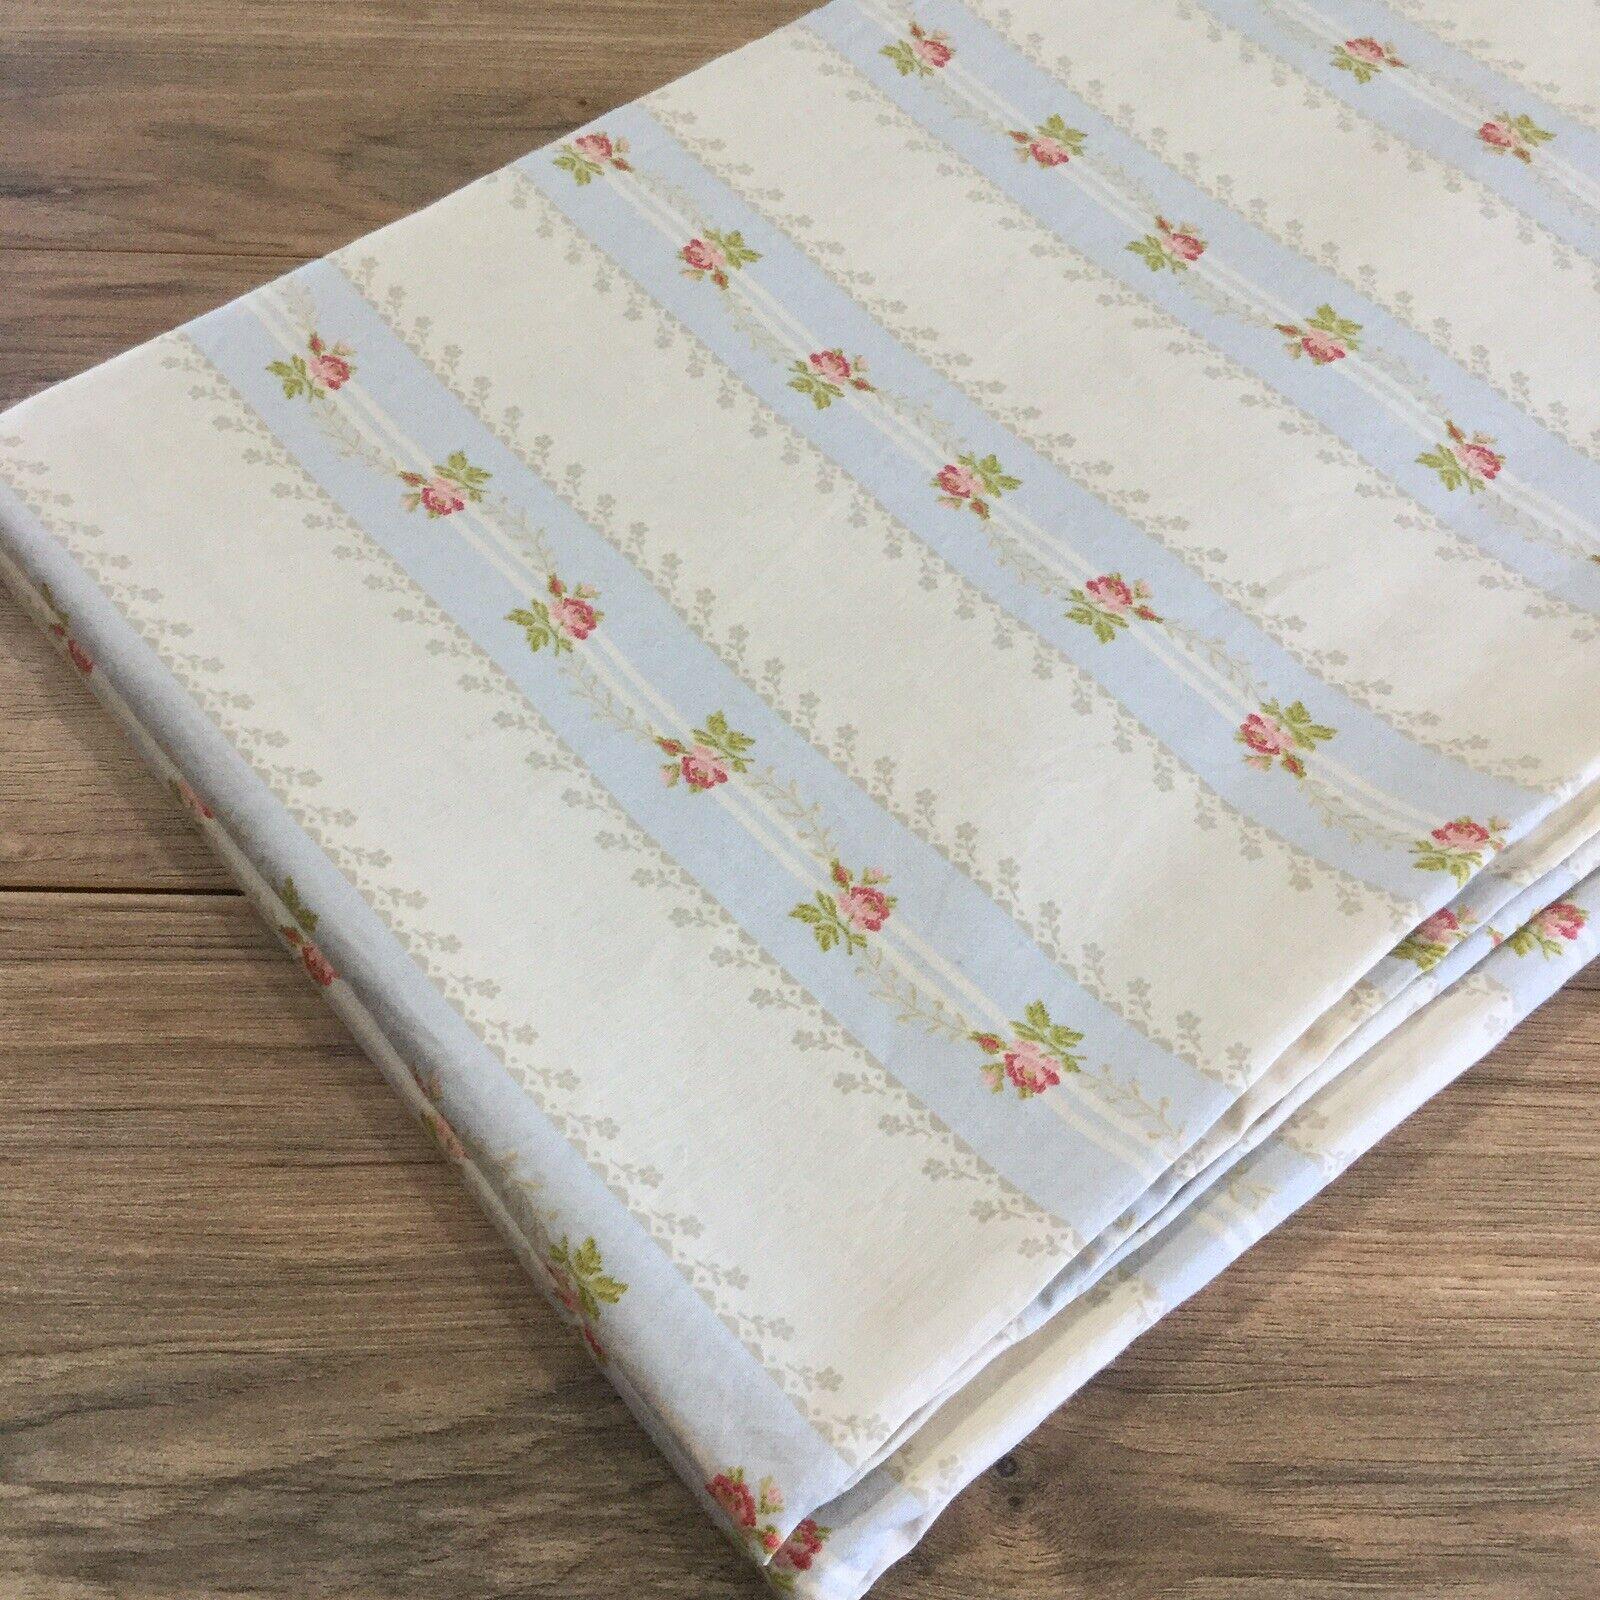 Ralph Lauren WENTWORTH WISTERIA Queen Striped Floral Sateen Flat Sheet Excellent